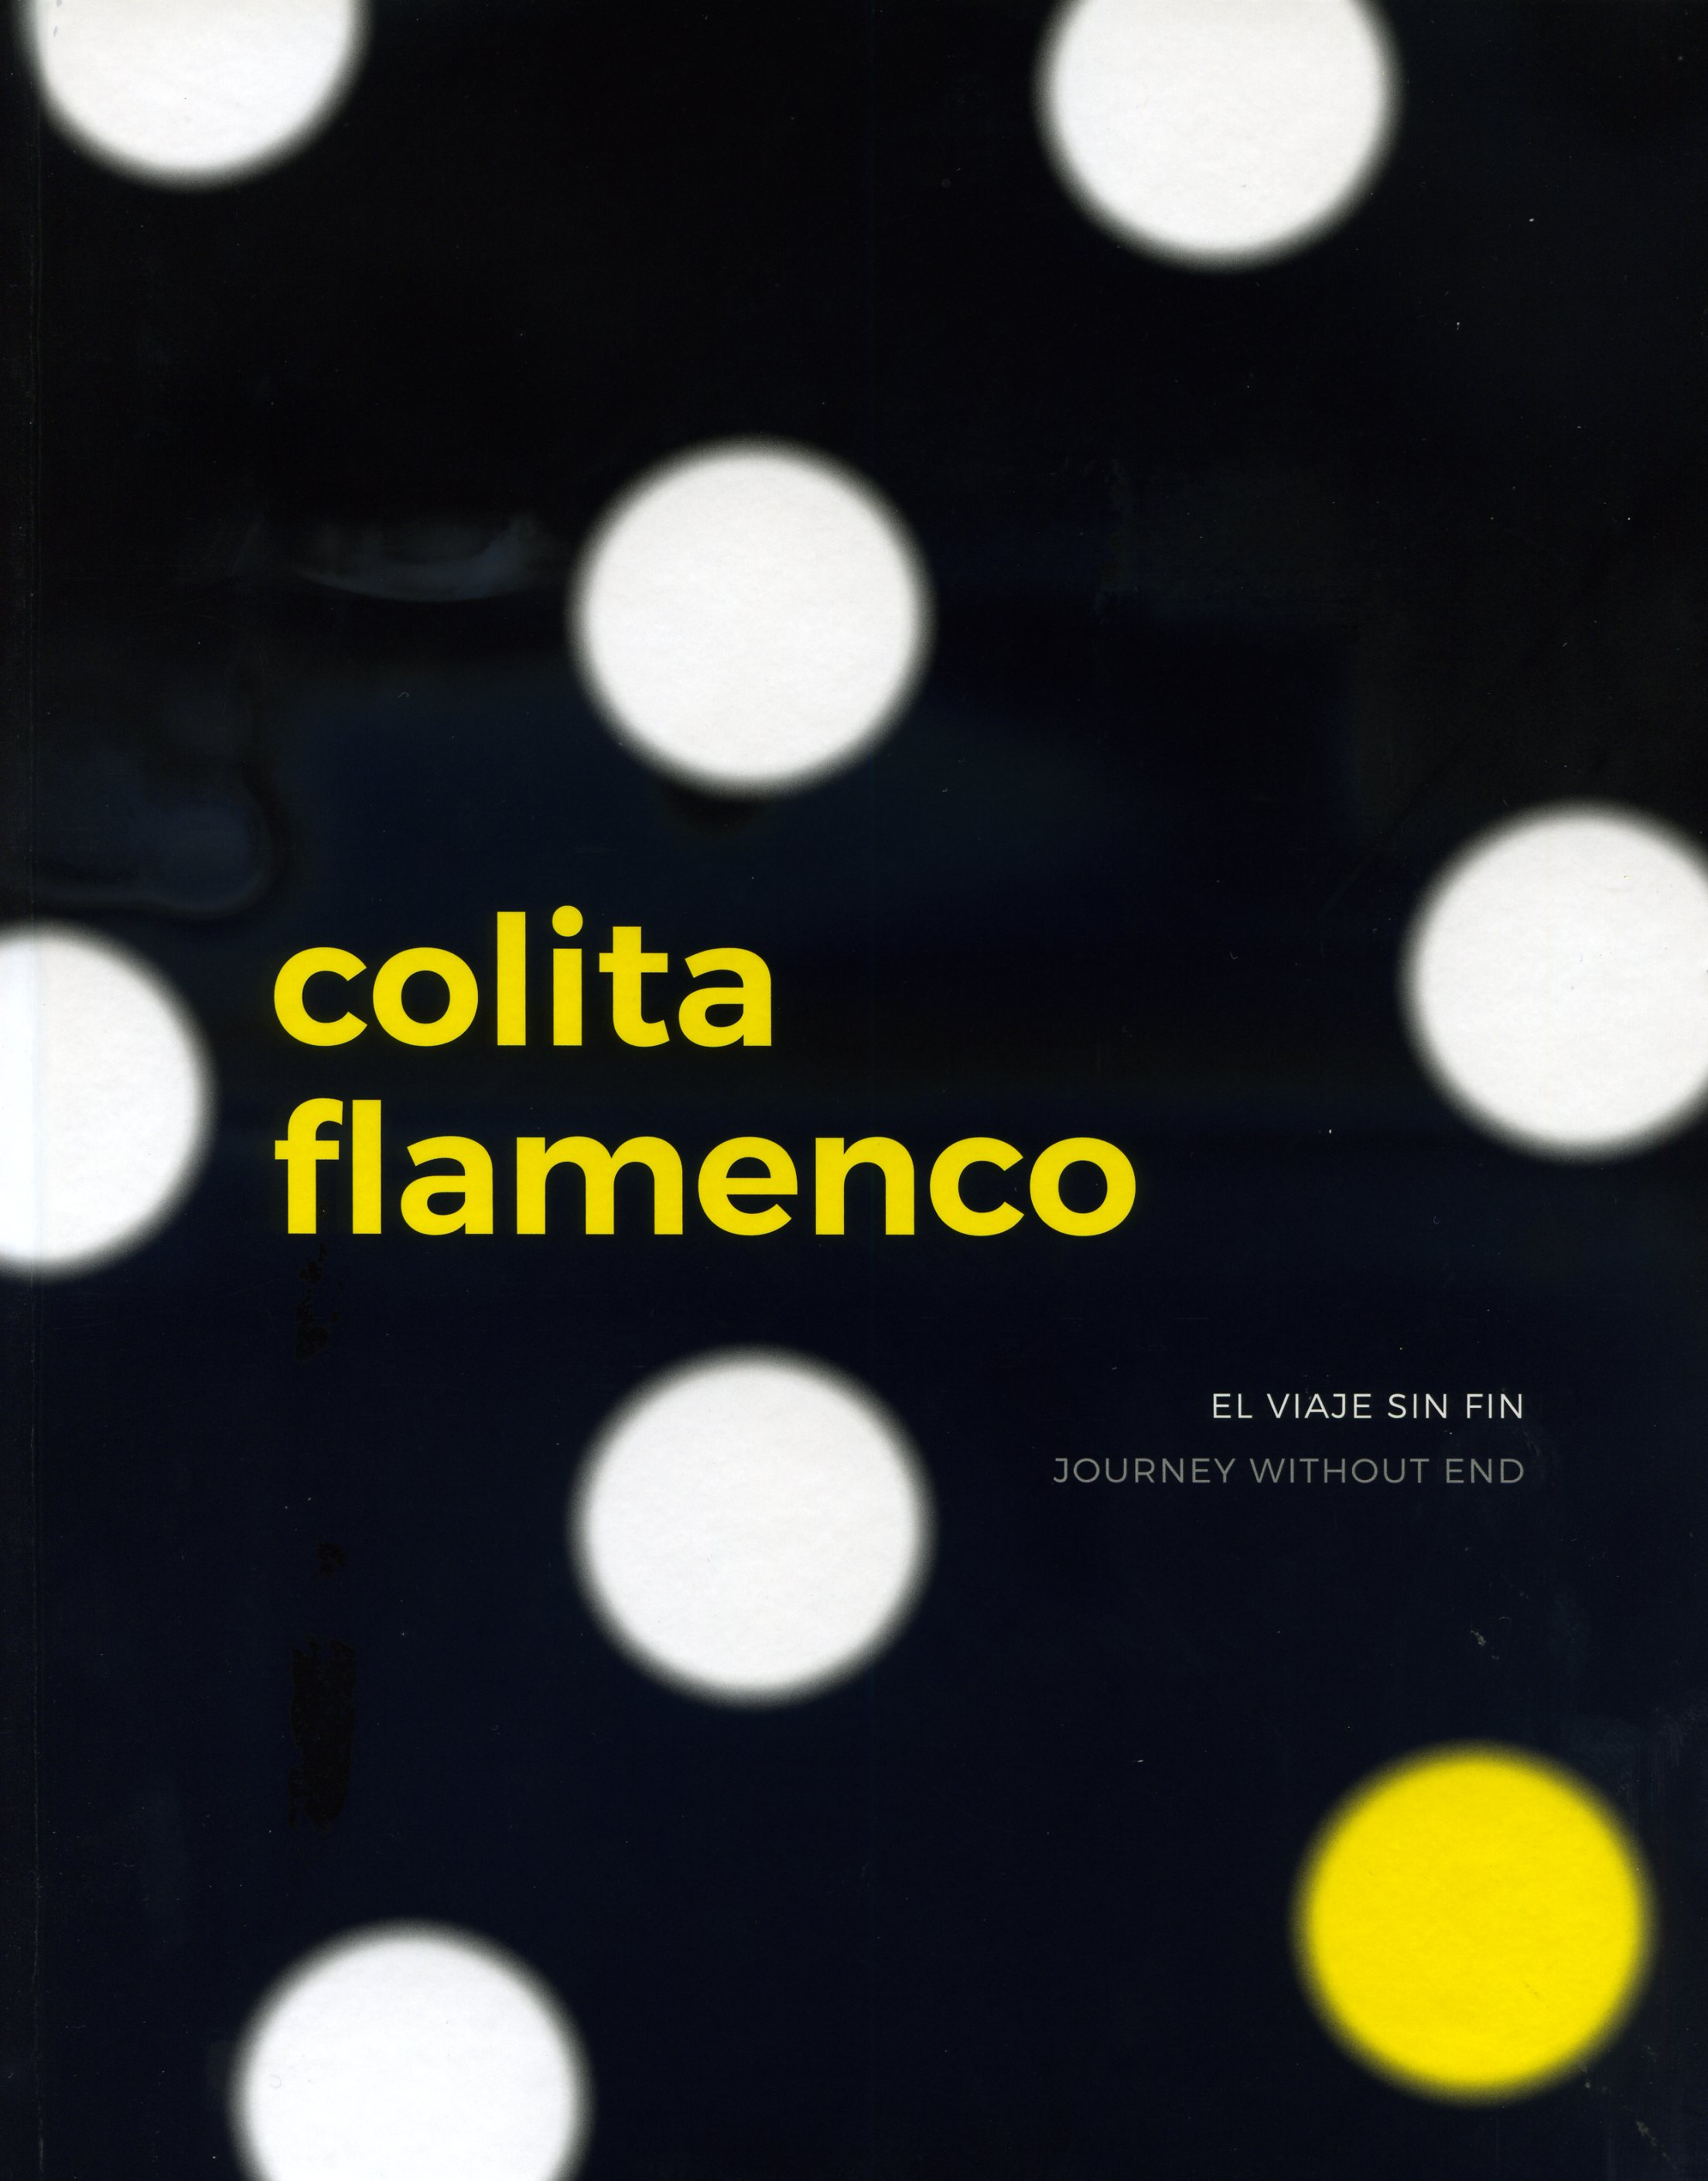 Colita flamenco. Un viaje sin fin